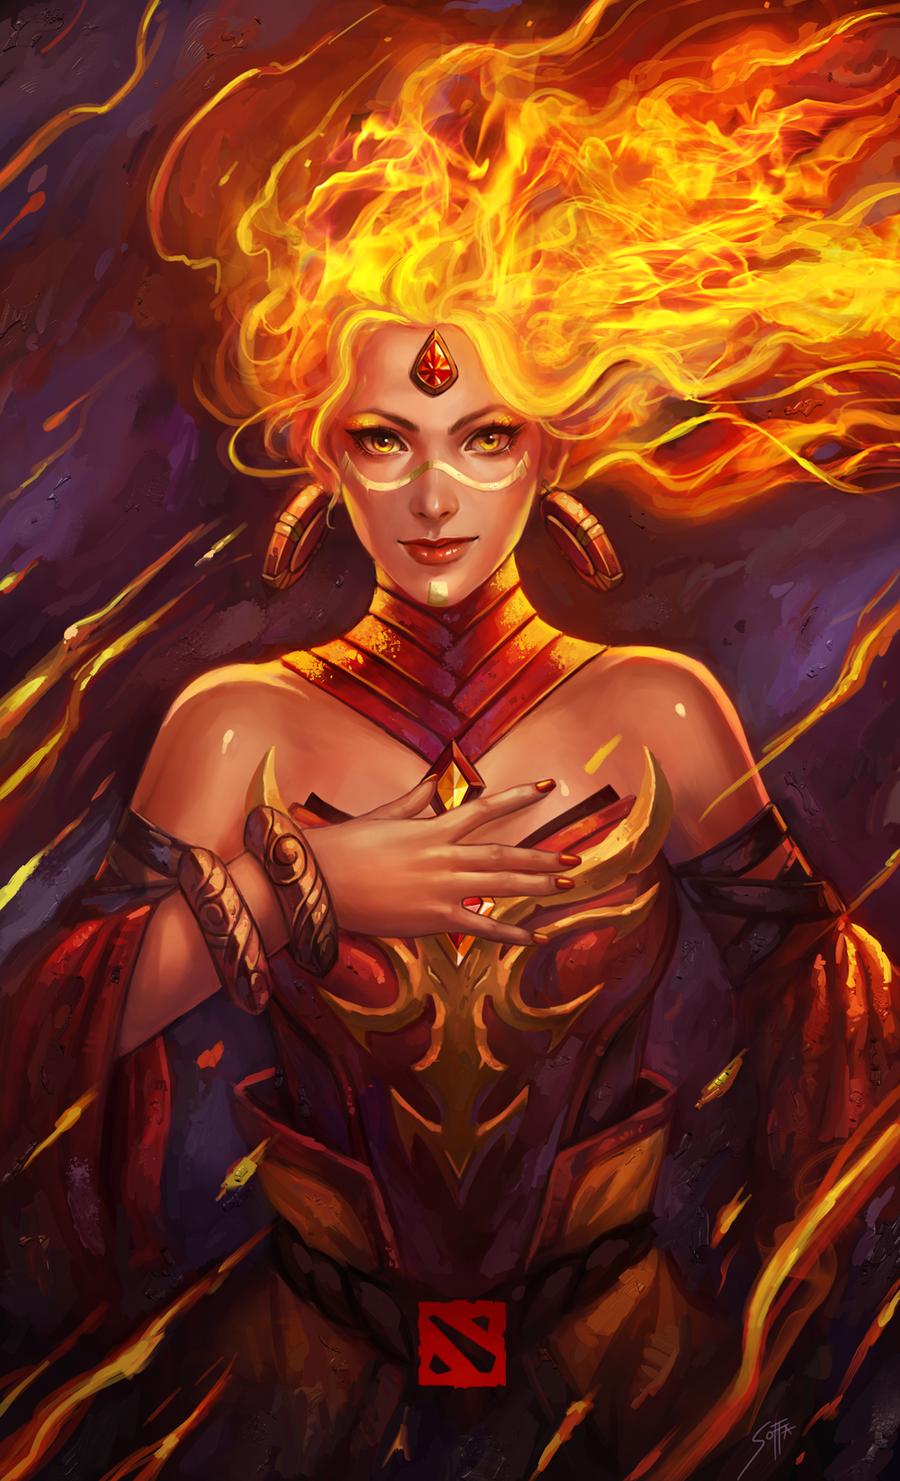 lina painting views fire fantasy fan art dota ace combat HD wallpaper